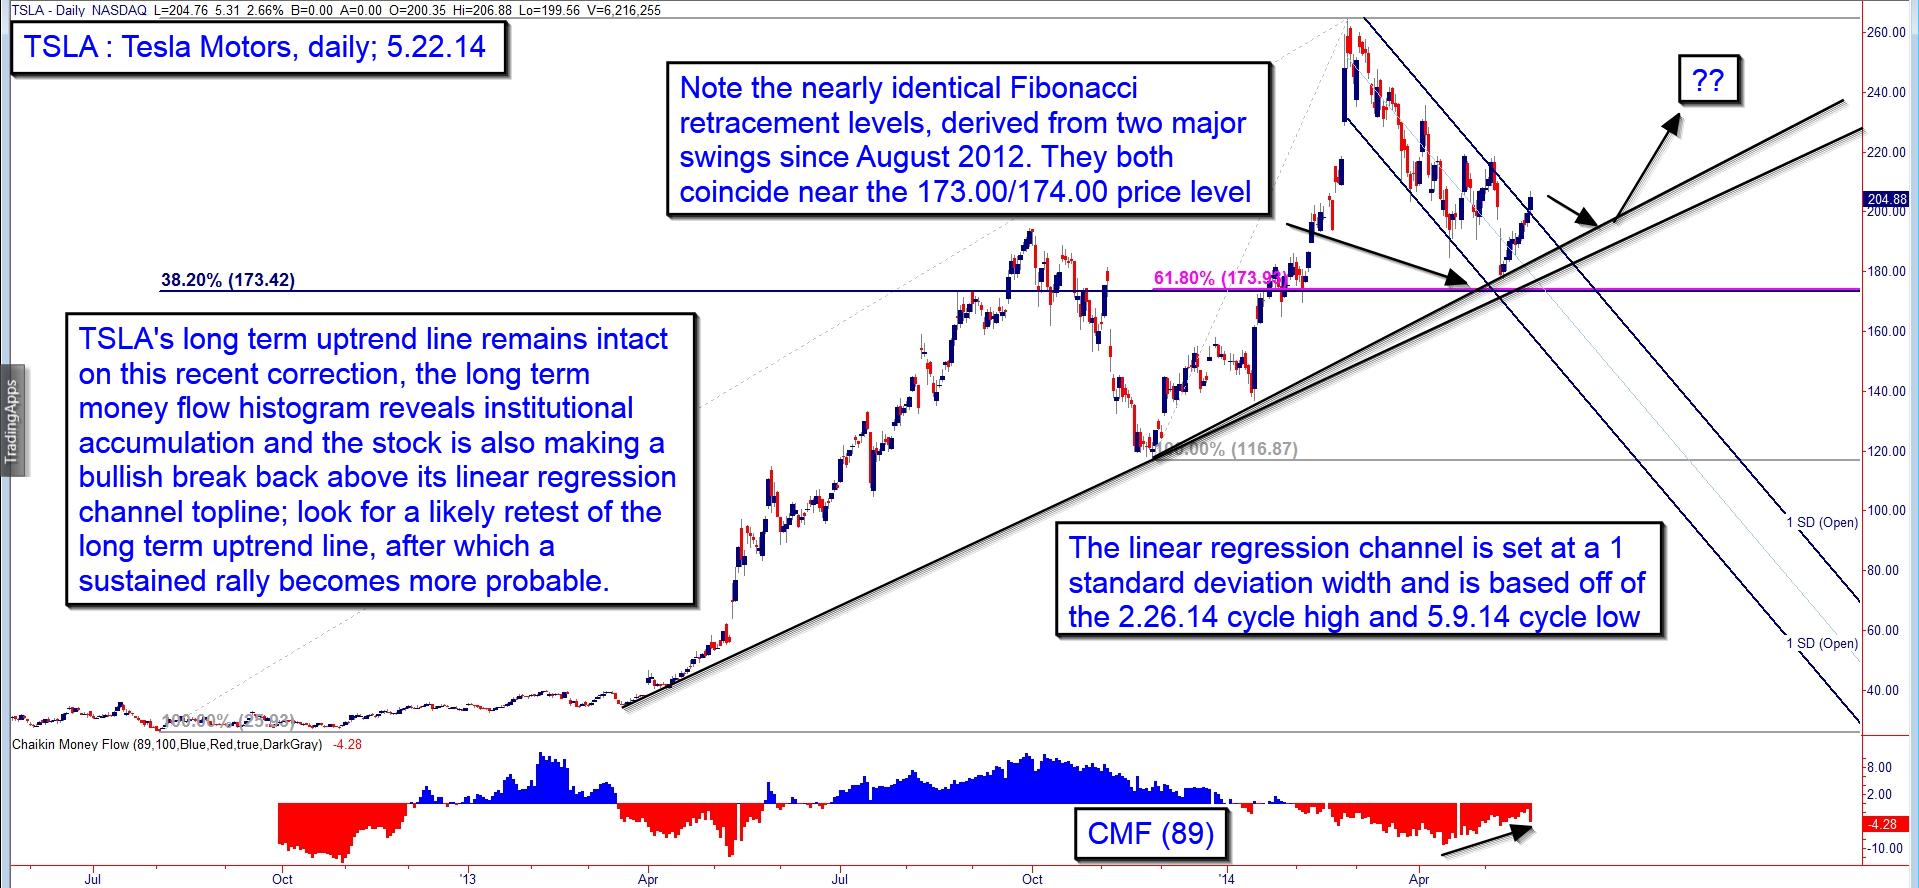 Fibonacci | TSLA: Prepping For A Rebound? | Traders com